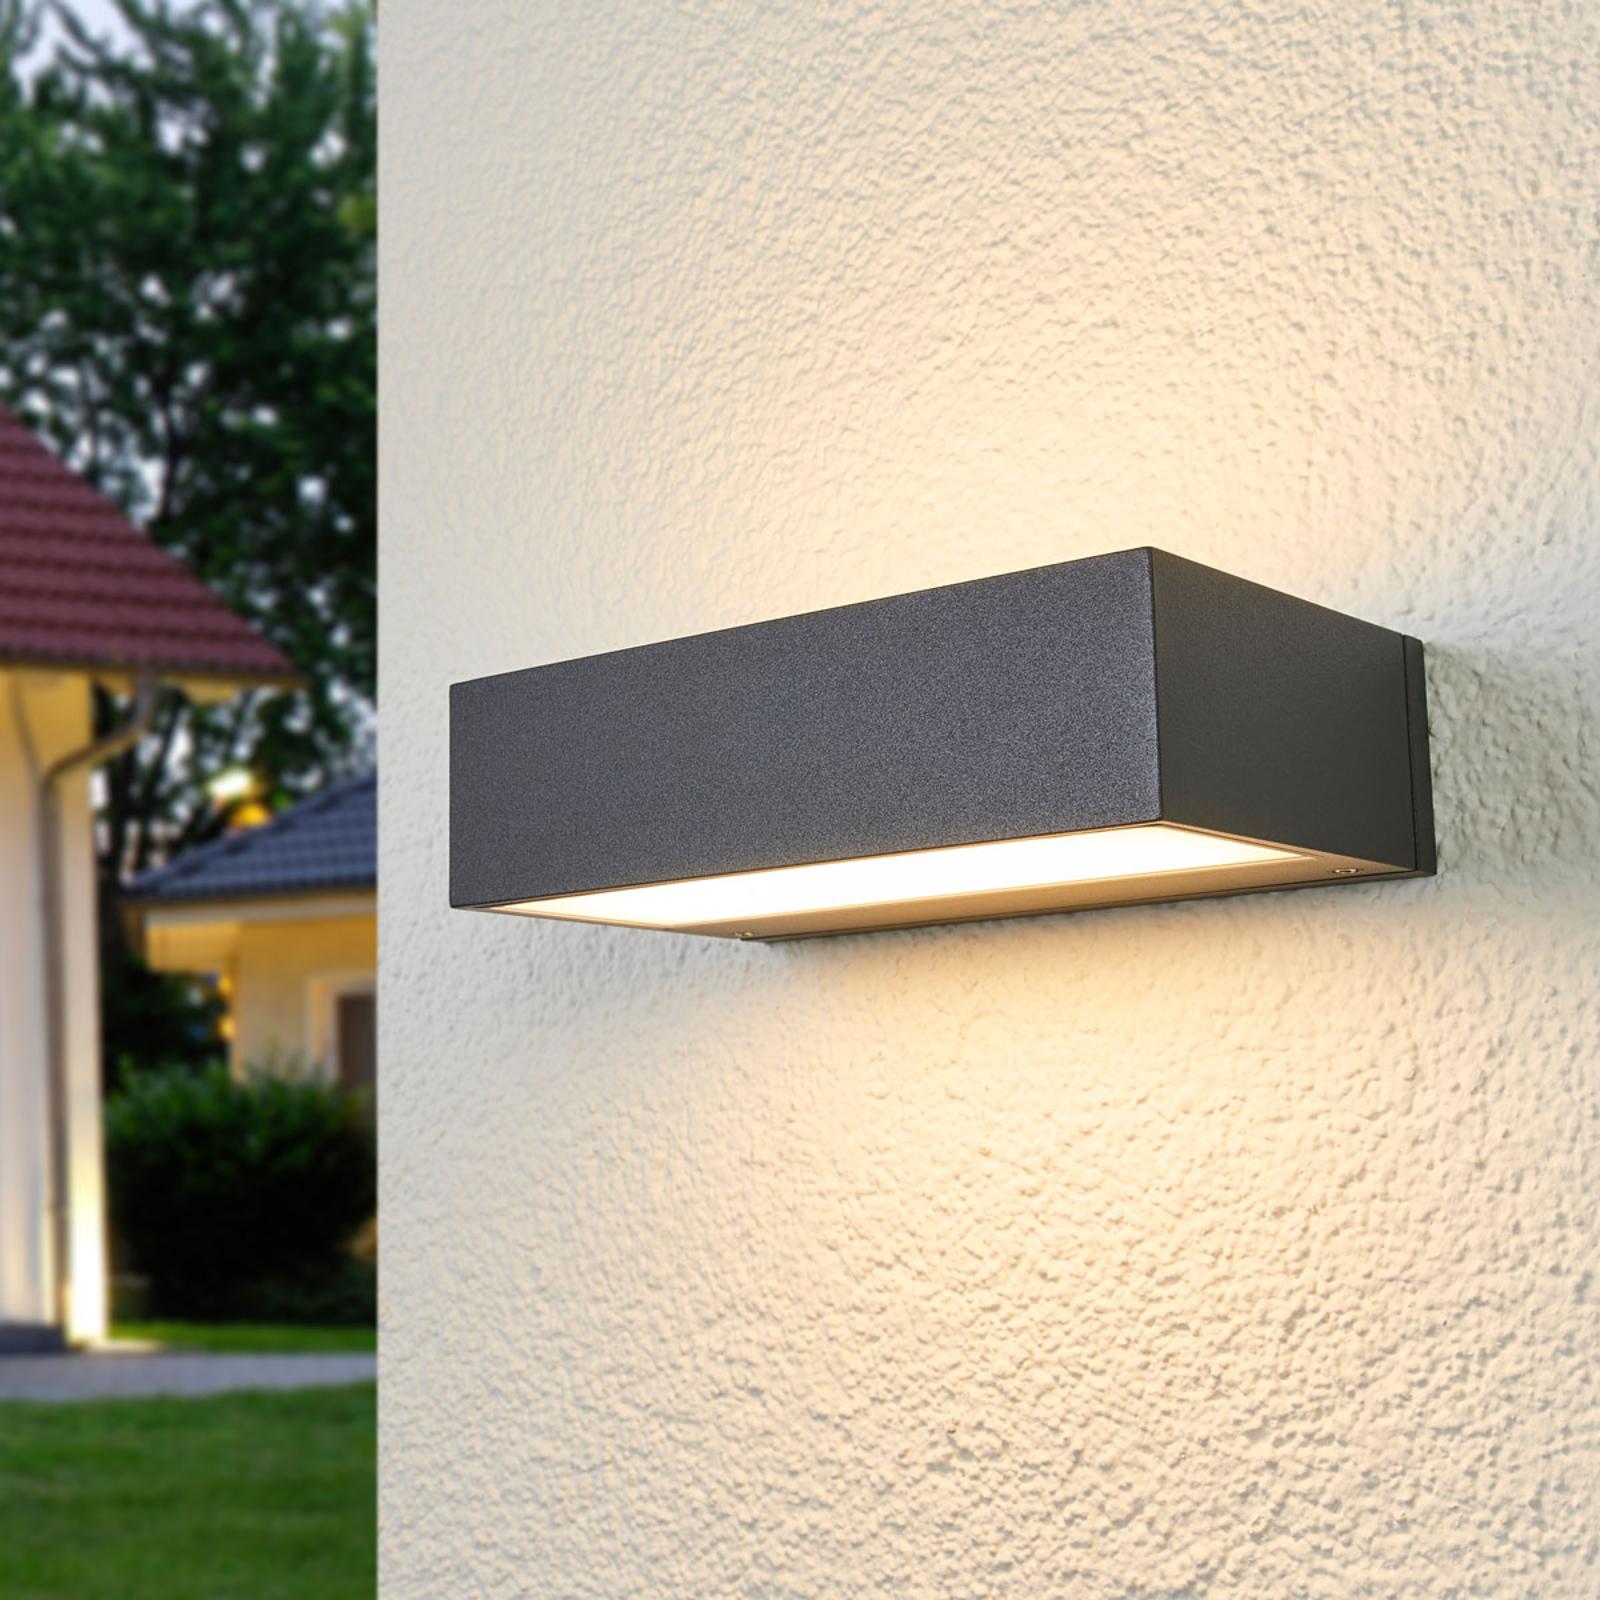 BEGA 33340K3 wall lamp up/down graphite 3,000K_1566015_1